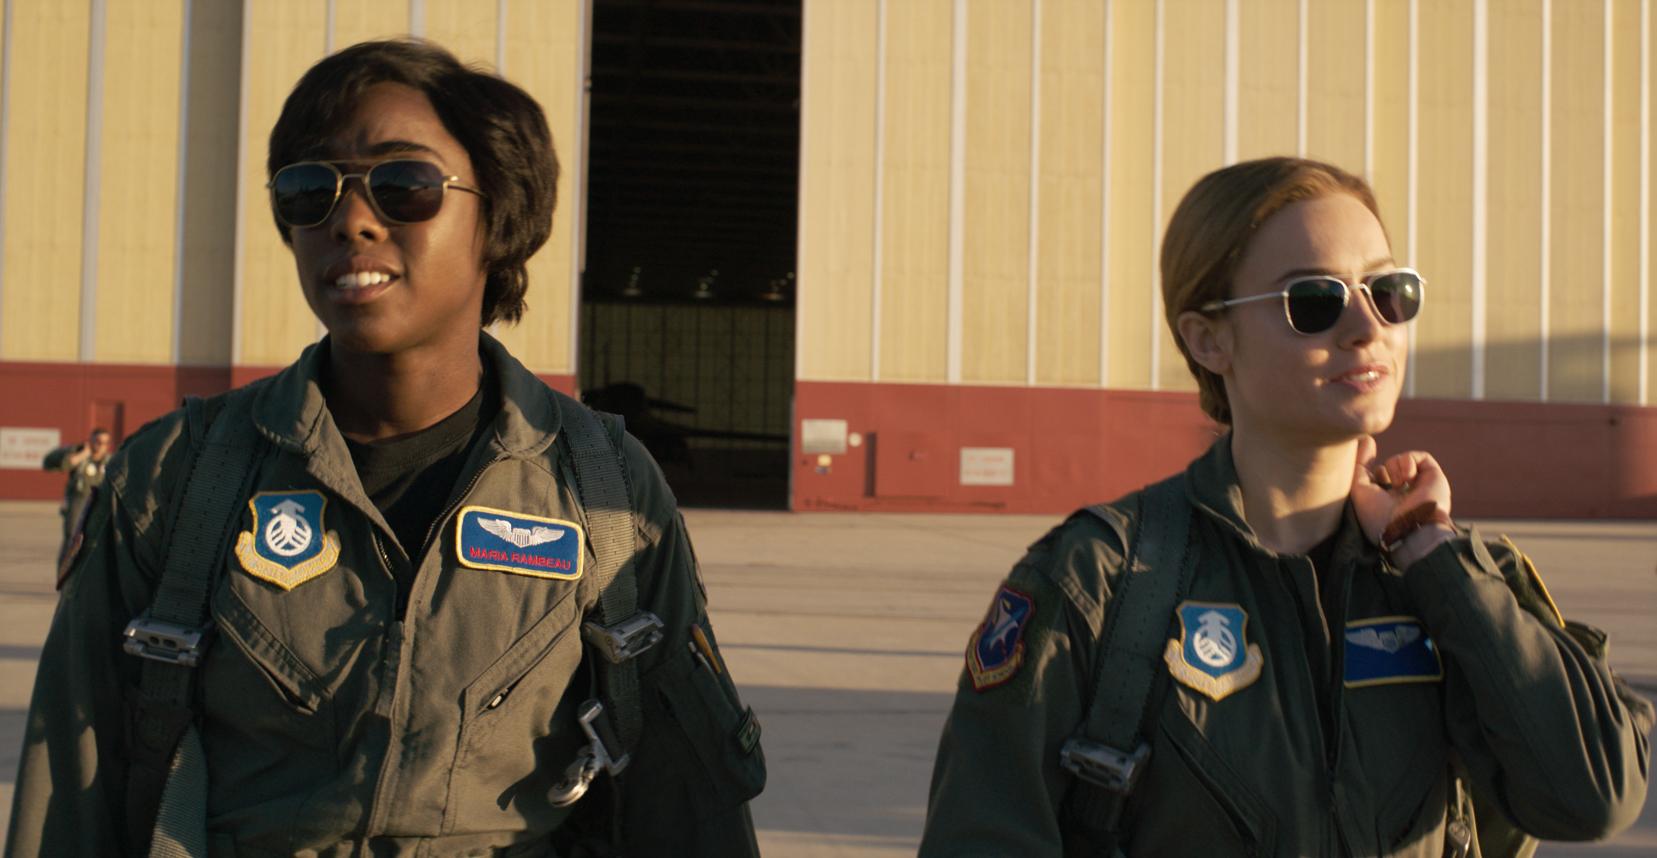 L to R: Maria Rambeau (Lashana Lynch) and Captain Marvel (Brie Larson)